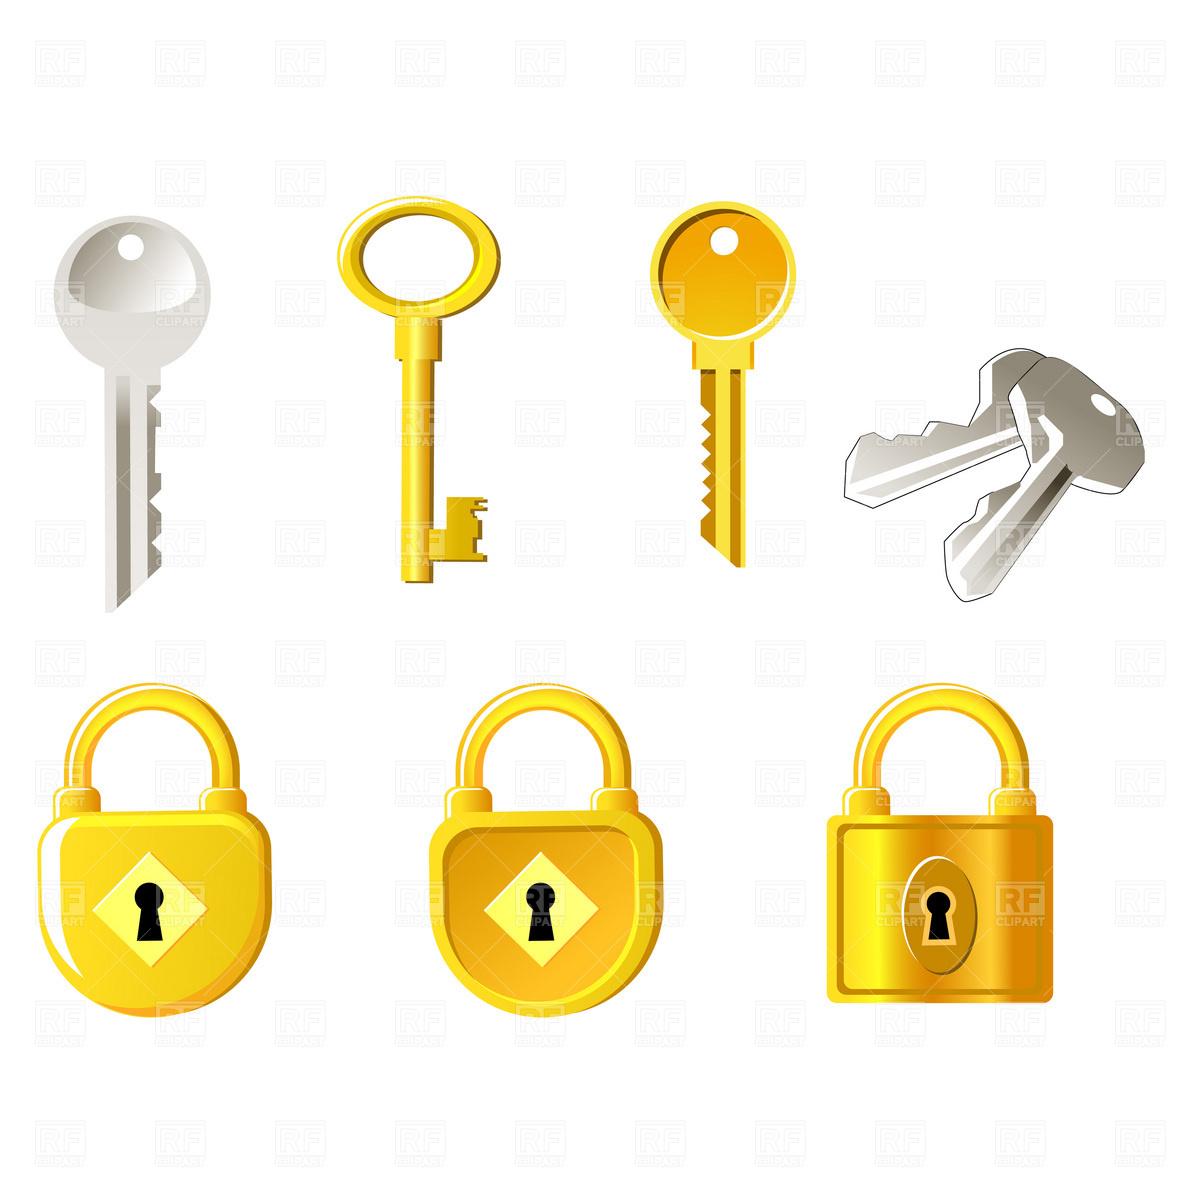 1200x1200 Locks And Keys Royalty Free Vector Clip Art Image